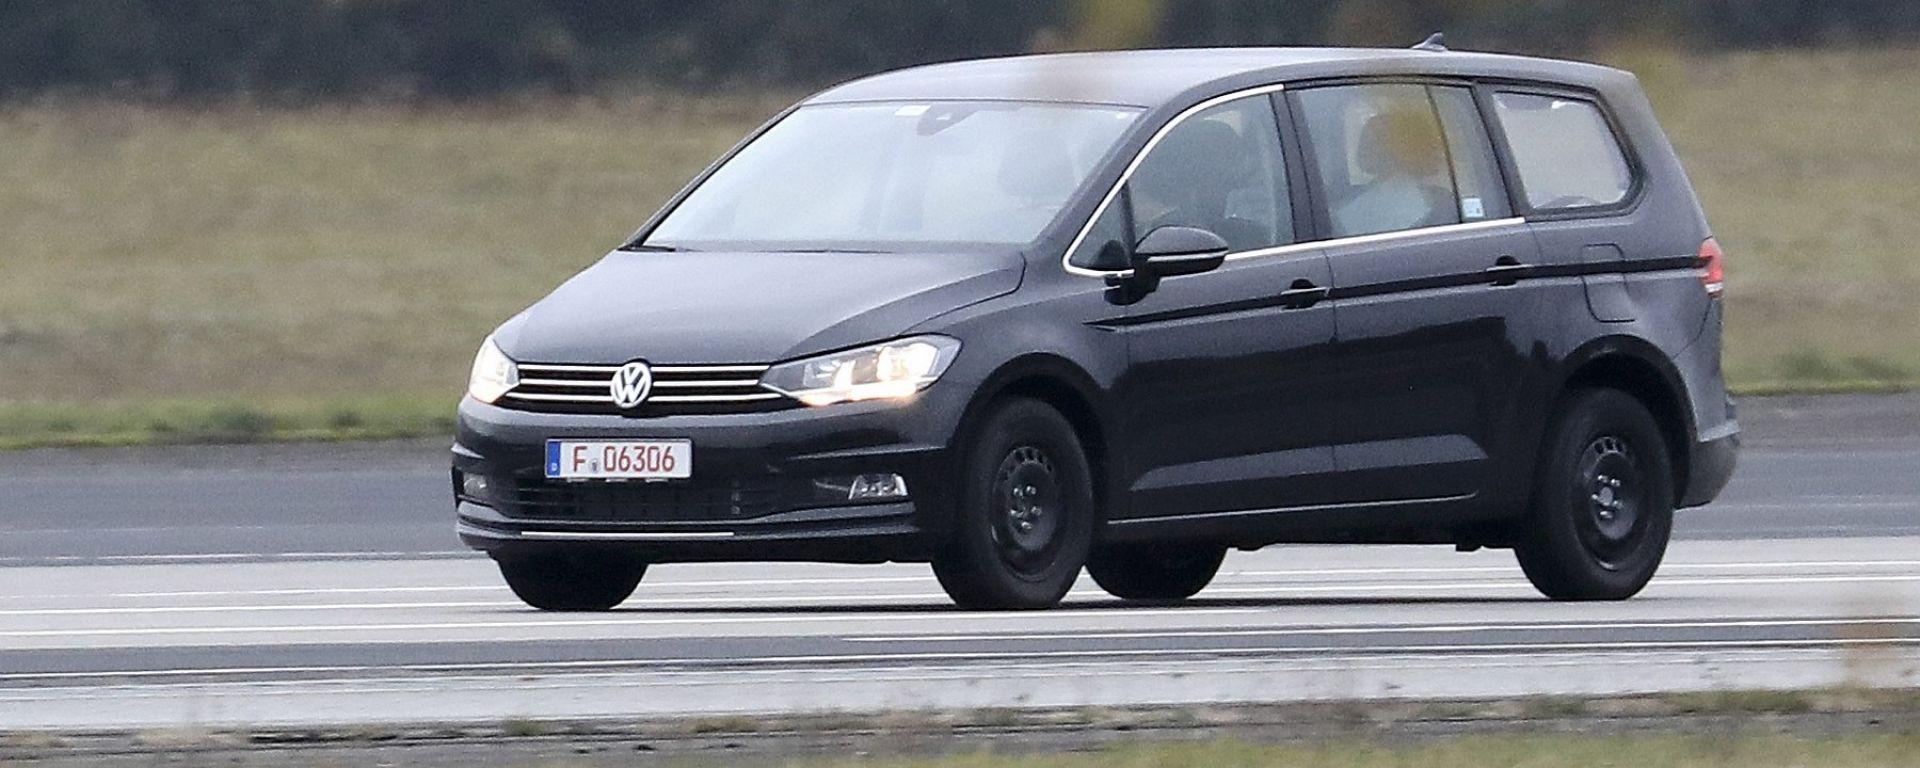 Volkswagen Variosport: una monovolume per sostituire Sportsvan e Touran